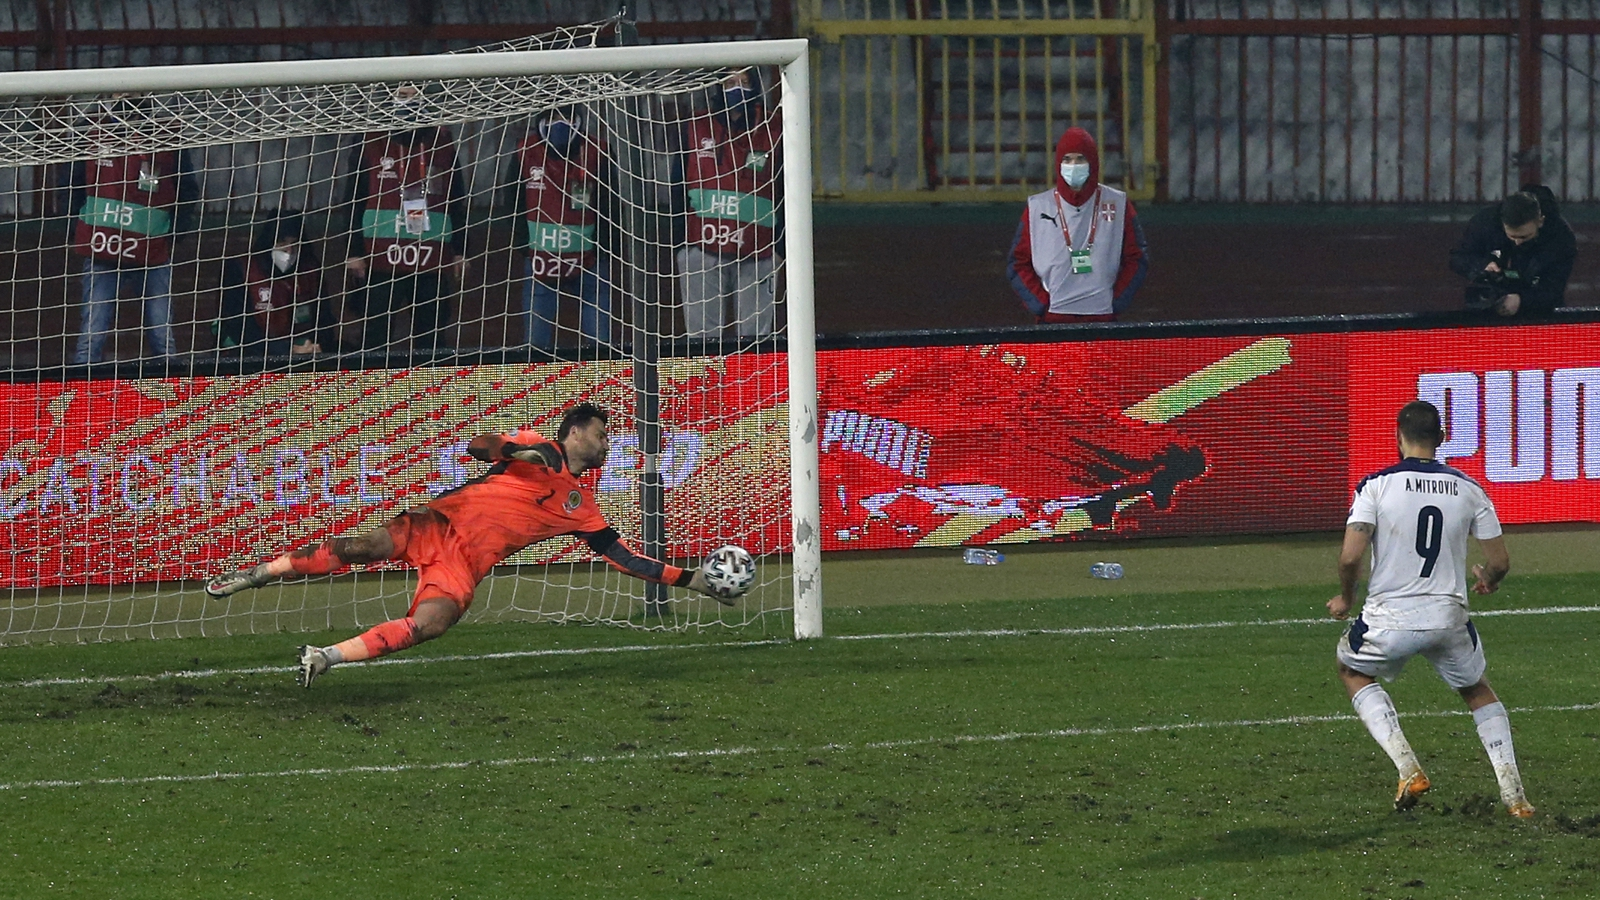 Image - David Marshall saves from Aleksander Mitrovic